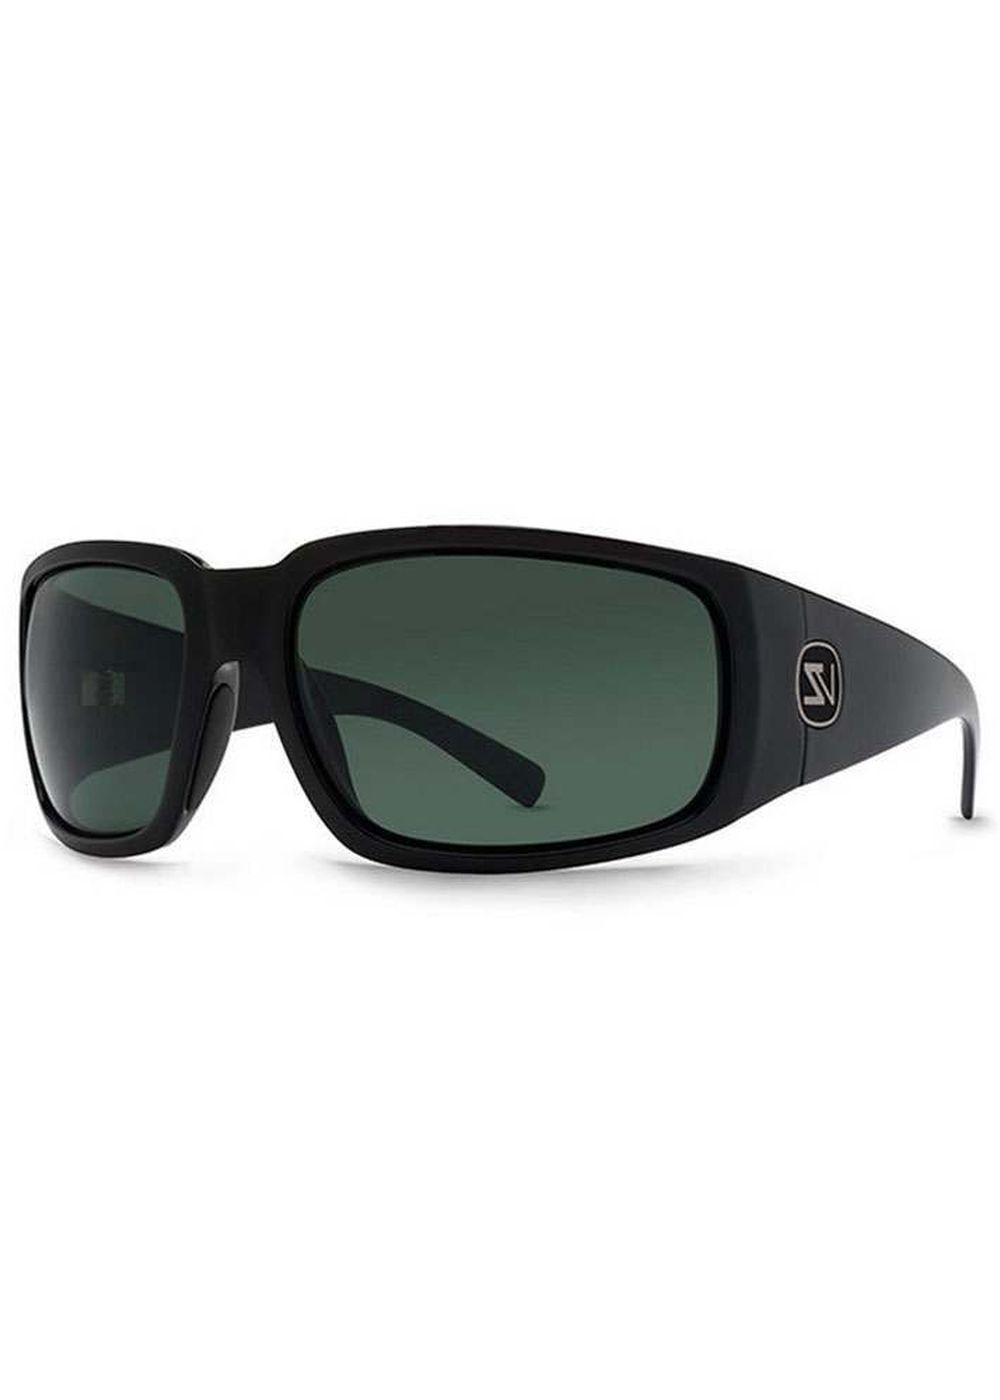 vonzipper-palooka-sunglasses-black-glossvint-grey